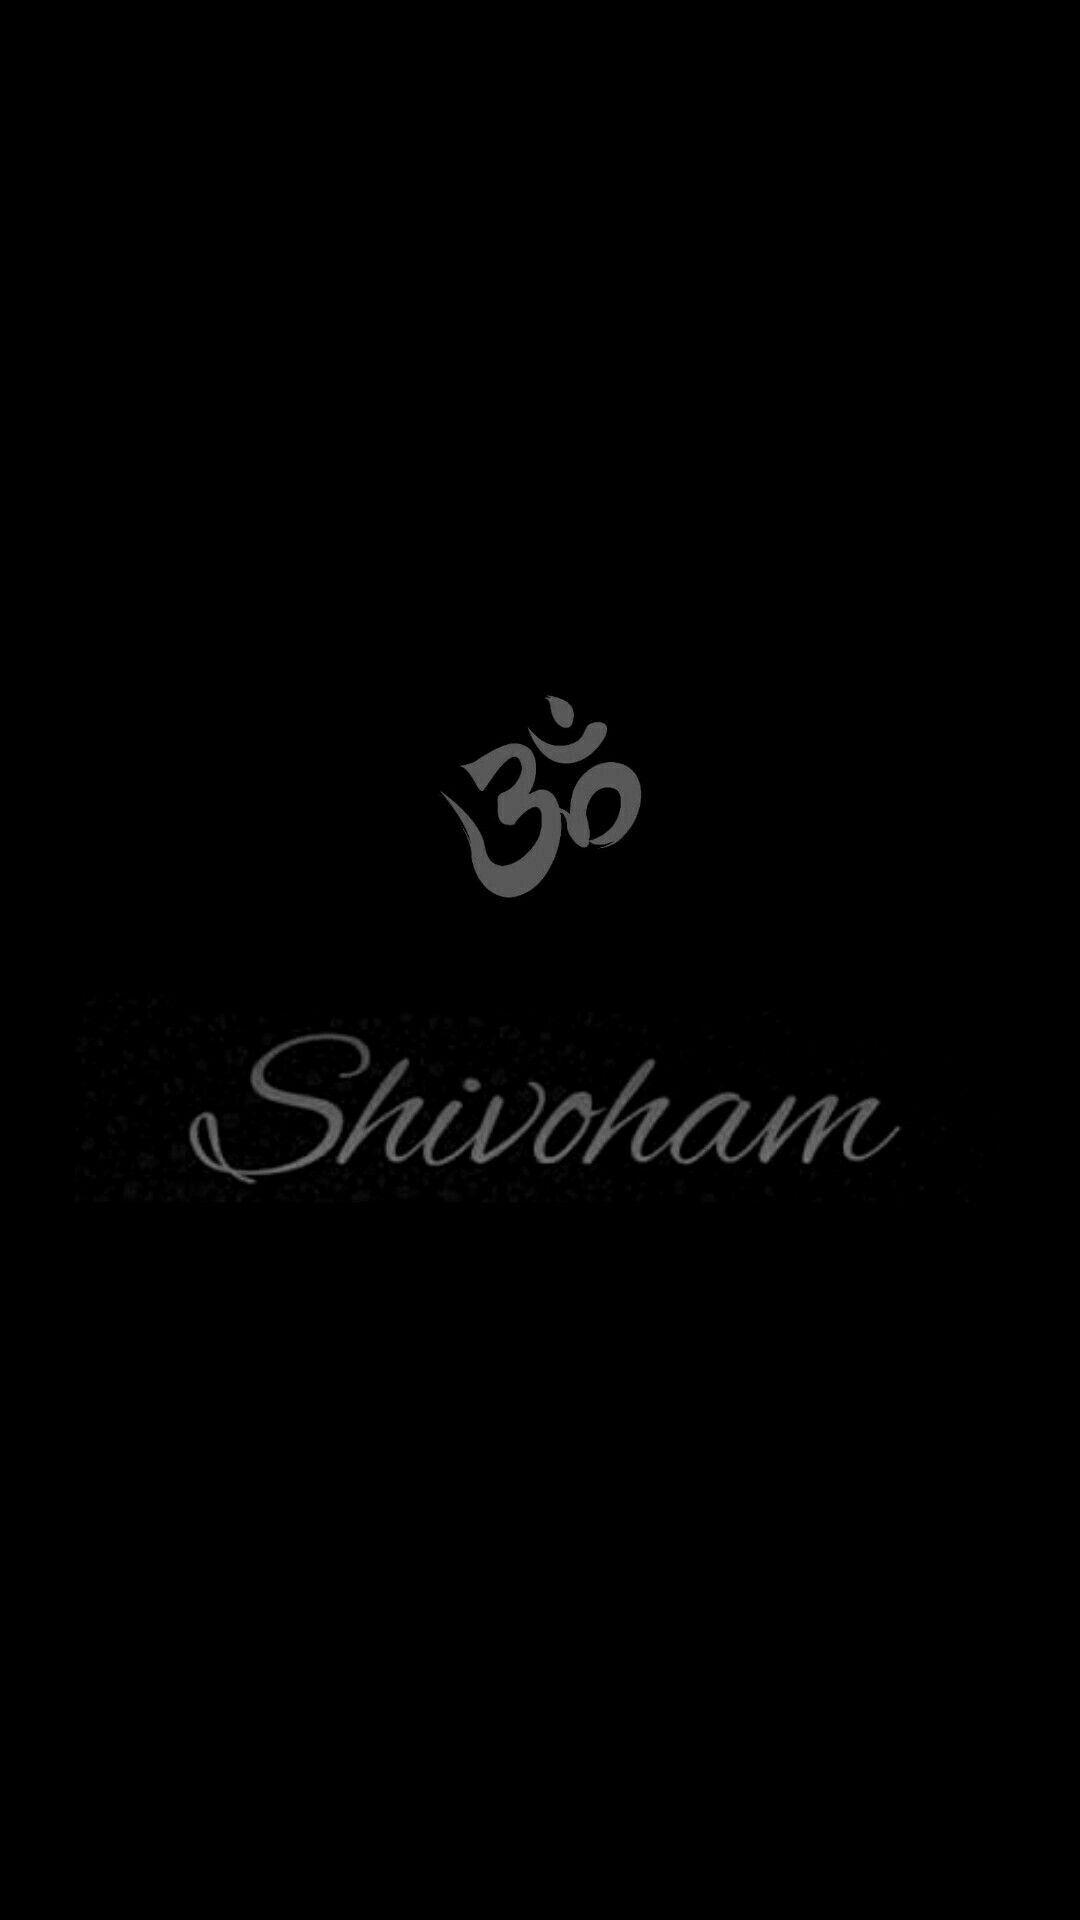 Shivoham | Shiva in 2019 | Shiva lord wallpapers, Lord shiva